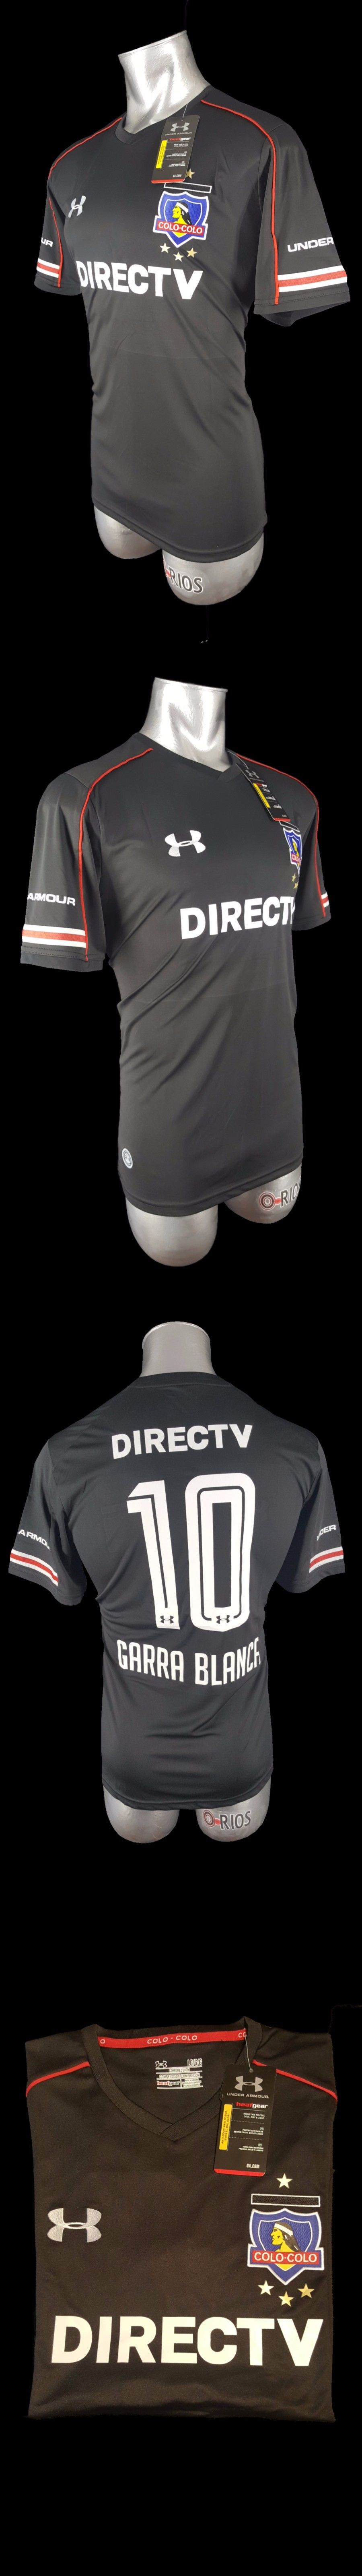 Men 123490  New Club Colo Colo De Chile Home Away Jersey - Garra Blanca  10  -  BUY IT NOW ONLY   49 on eBay! 5fdcd57d31a4e